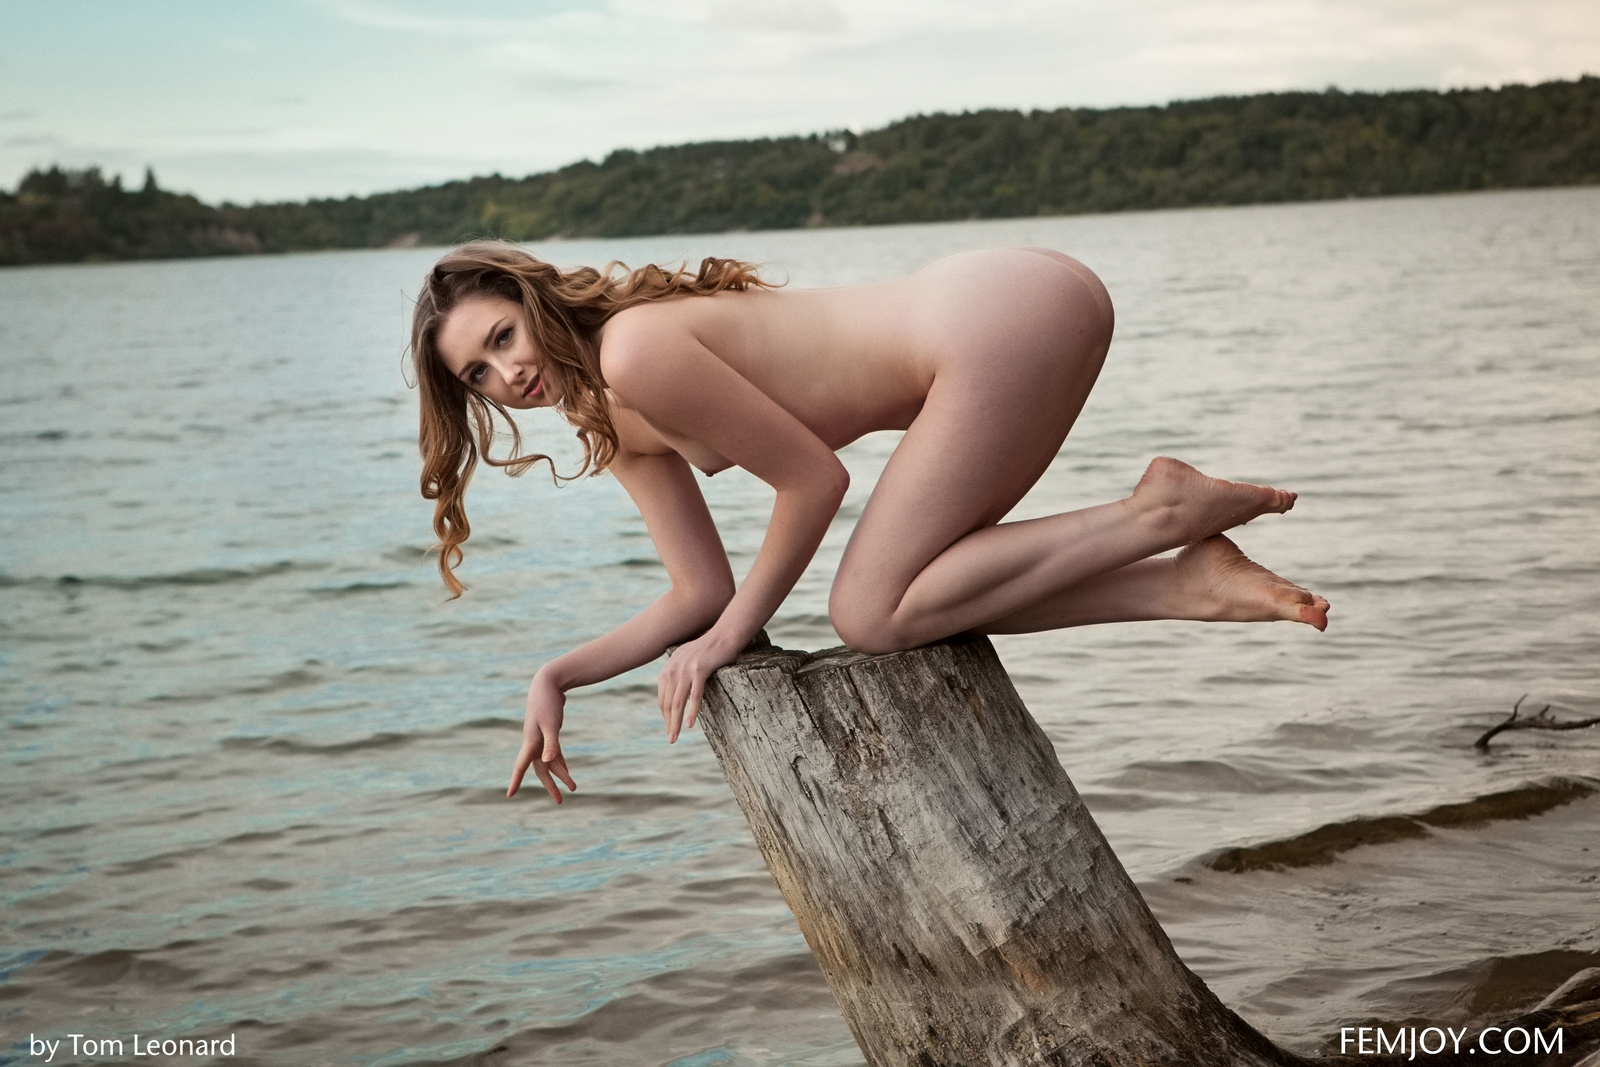 Zdjęcie porno - 01 1 - Zgrabna i naga laska nad jeziorkiem